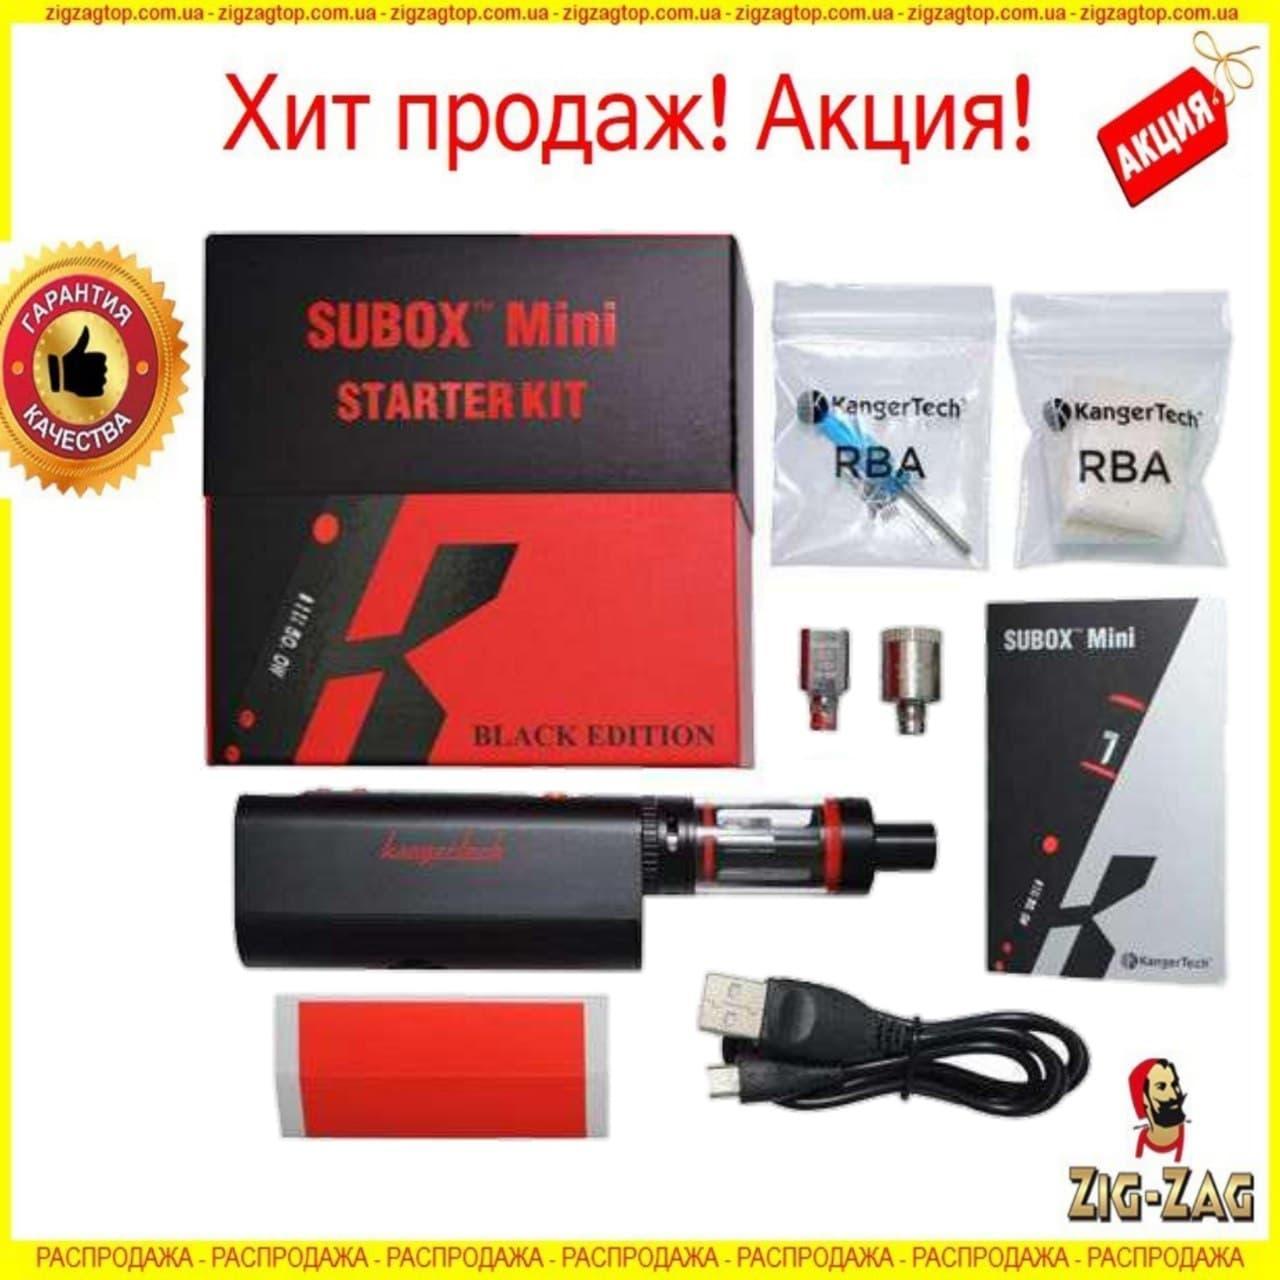 Электронная Cигарета KangerTech Subox Mini Starter Kit 50W +АККУМУЛЯТОР! Бокс Мод Кангертех субокс мини ВЕЙП